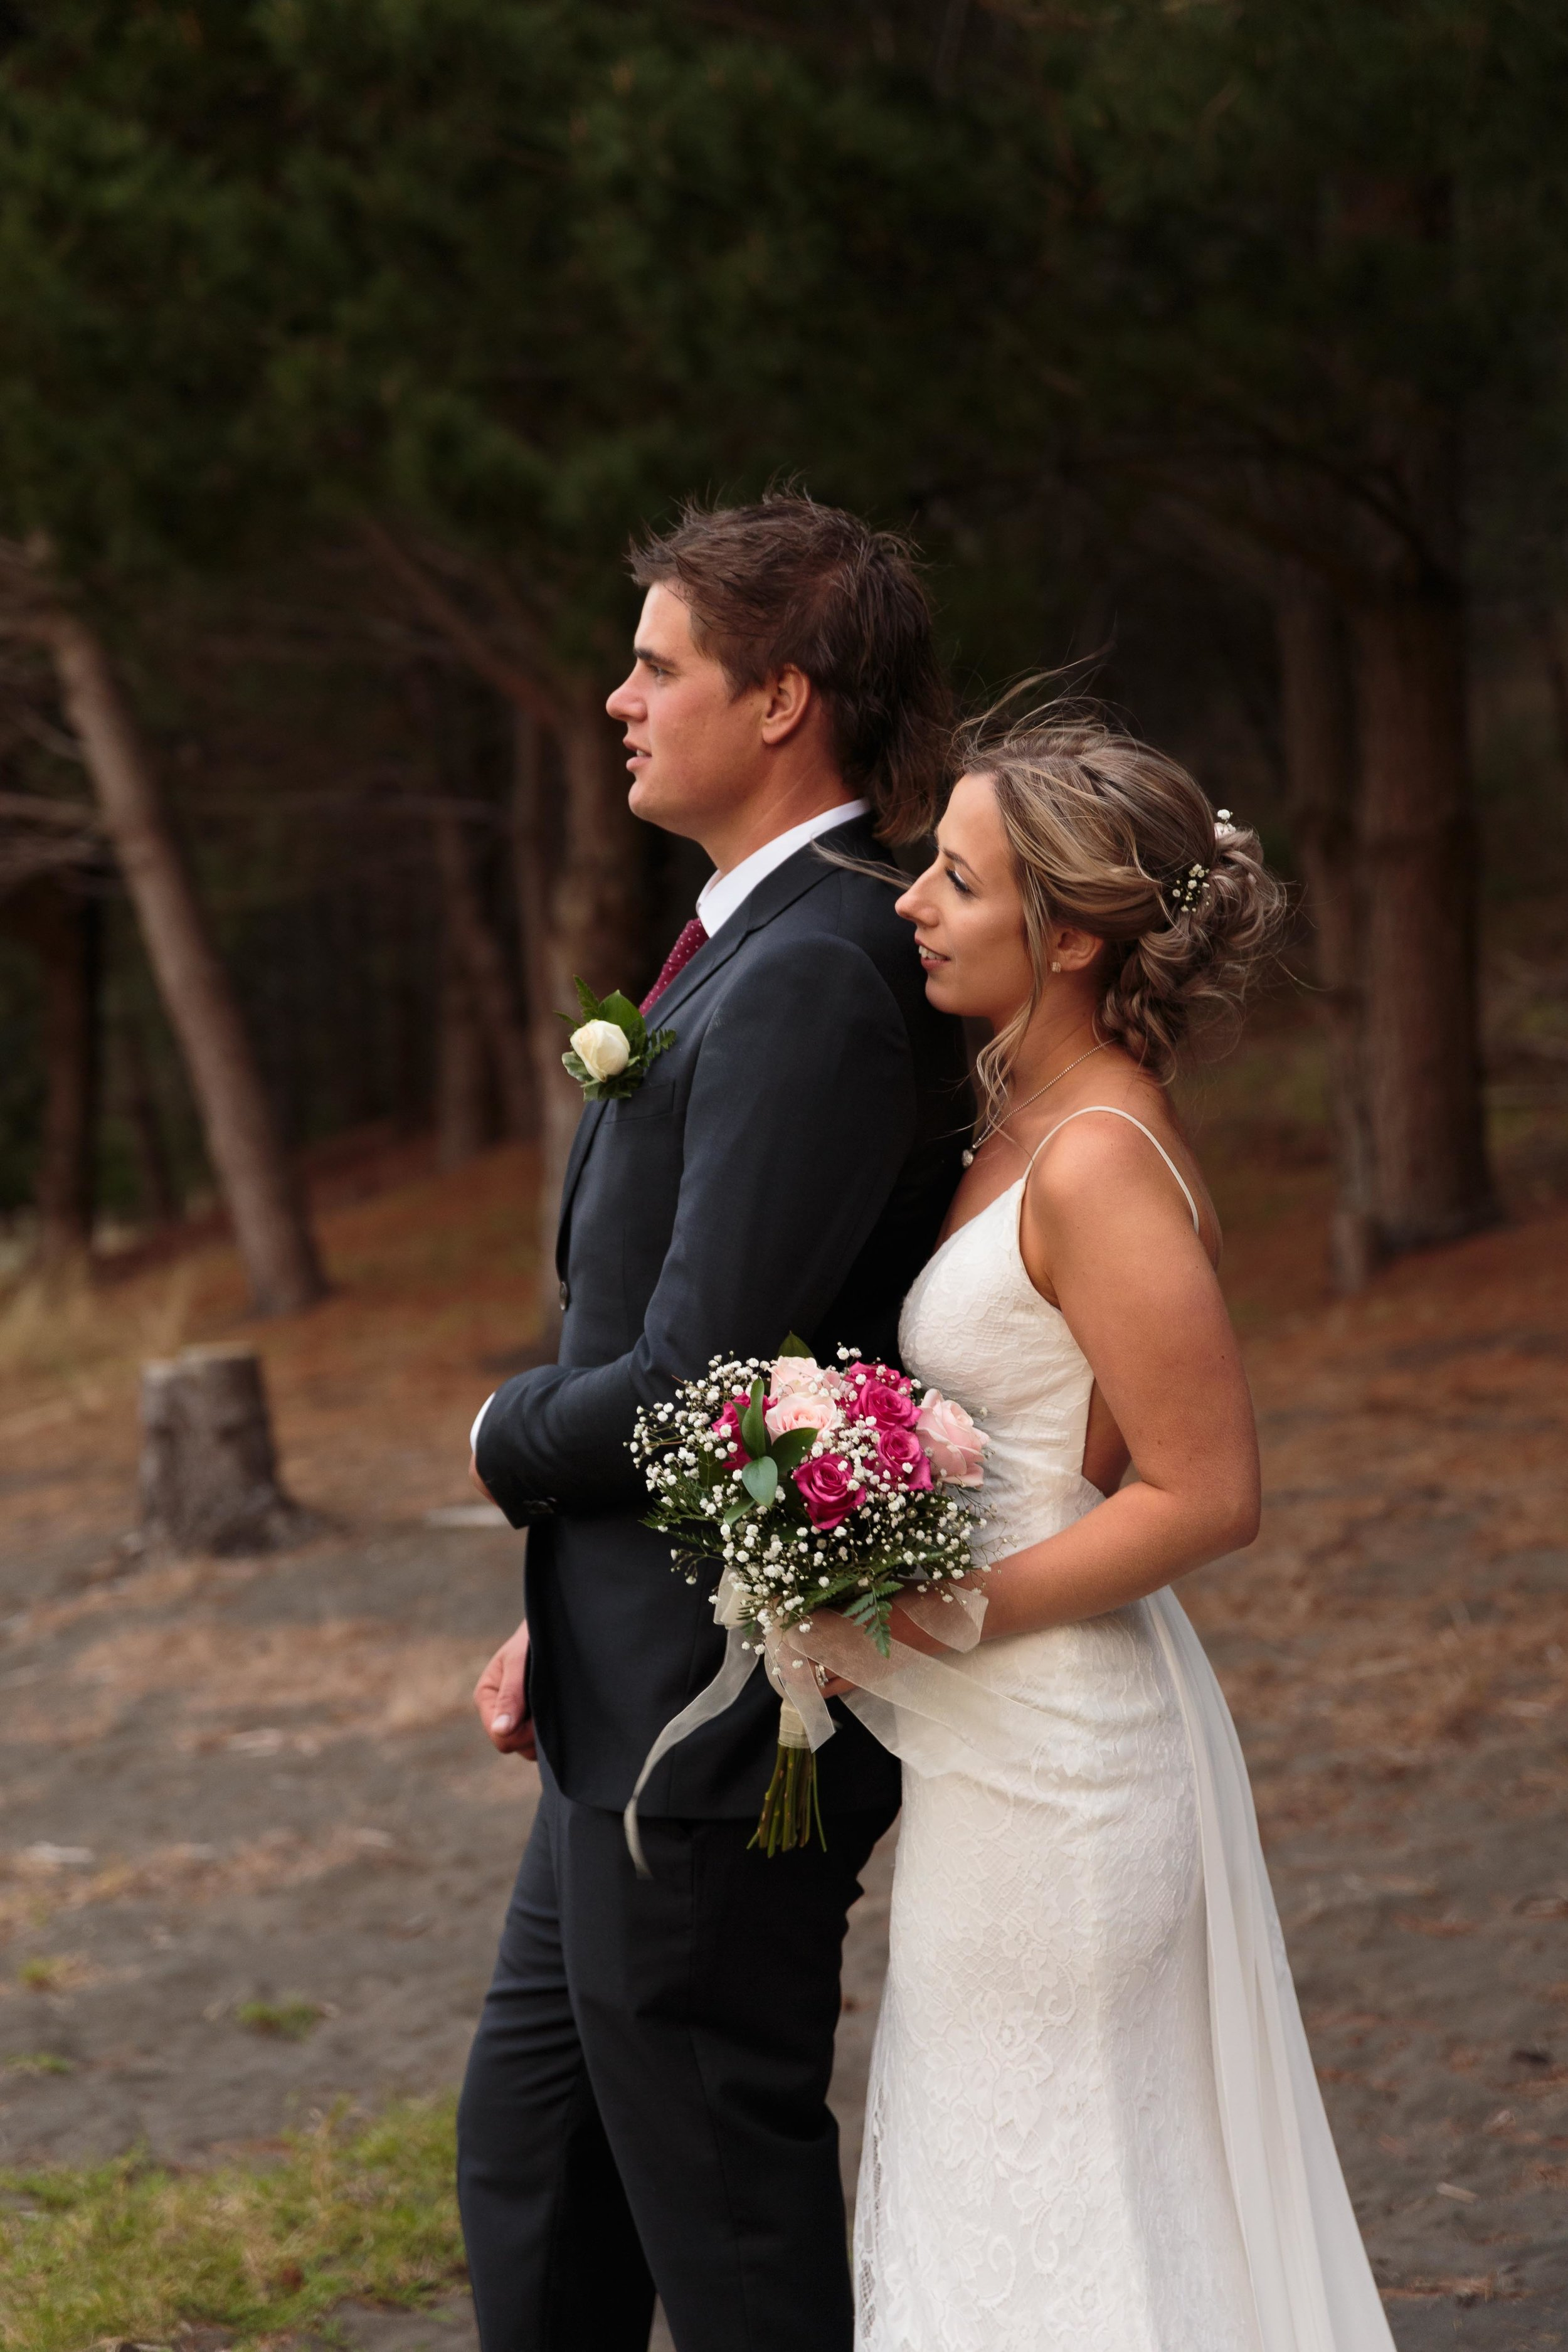 Highight-wedding-photography-dudding-lake-palmerston-north-new-zealand-91.jpg